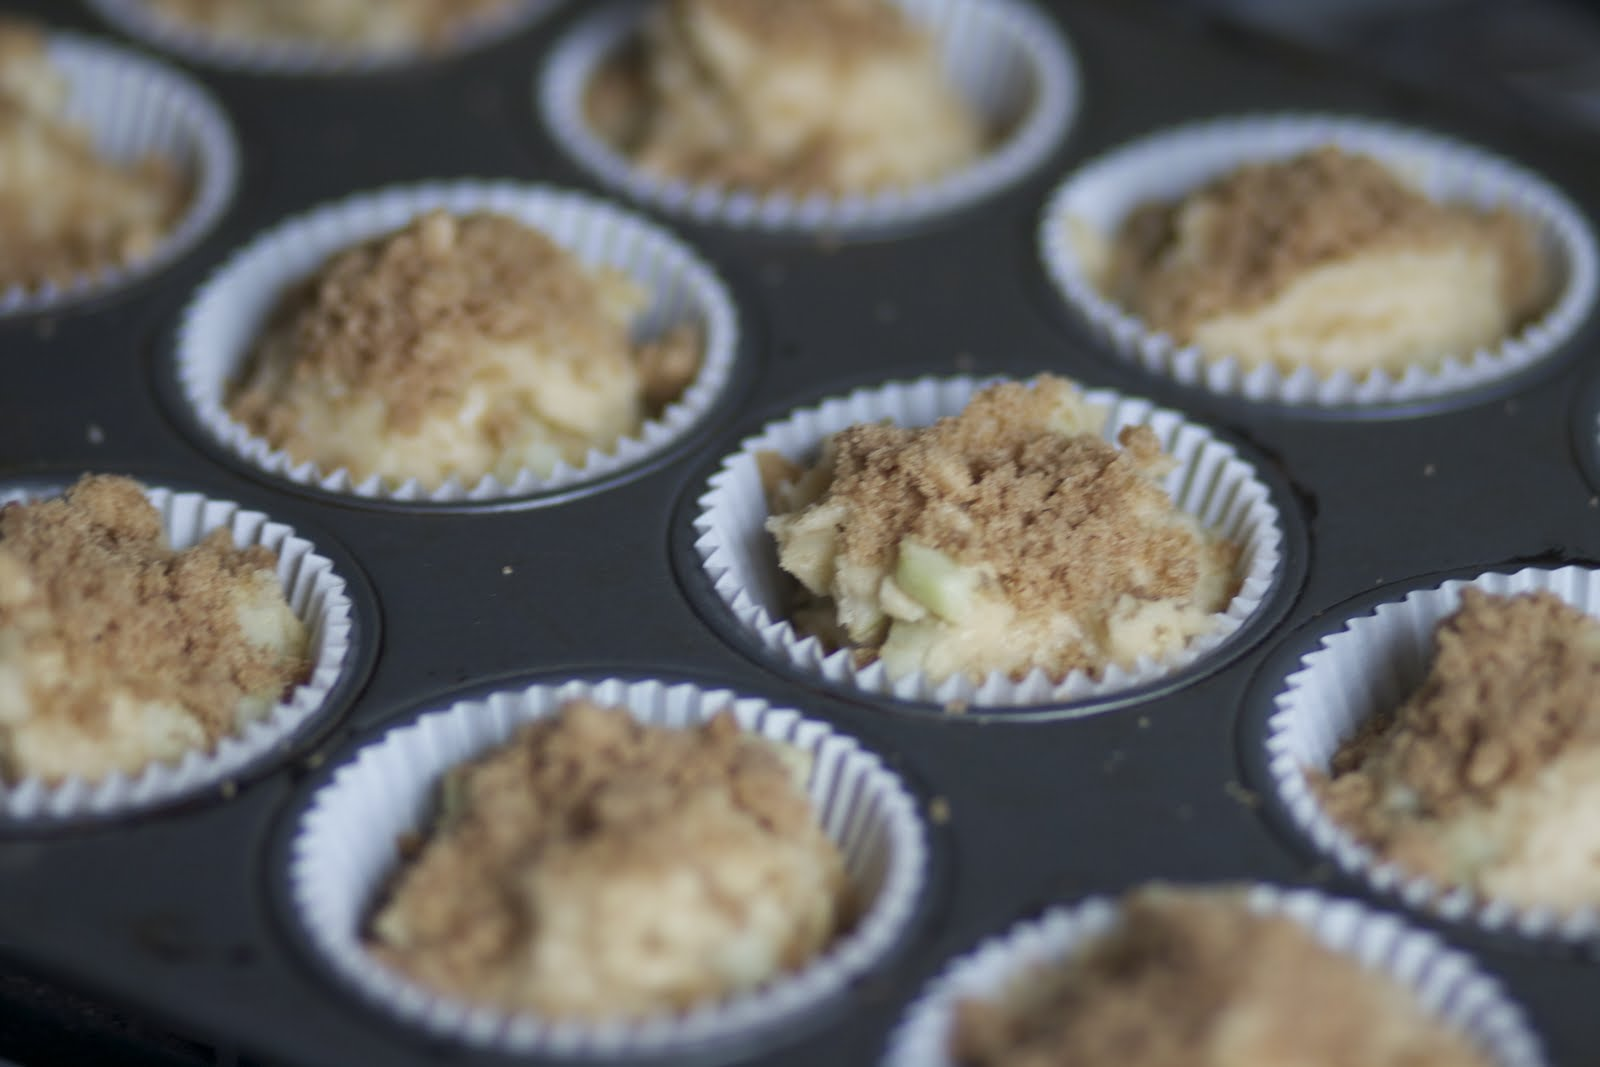 Apple-Cinnamon Crumble Muffins